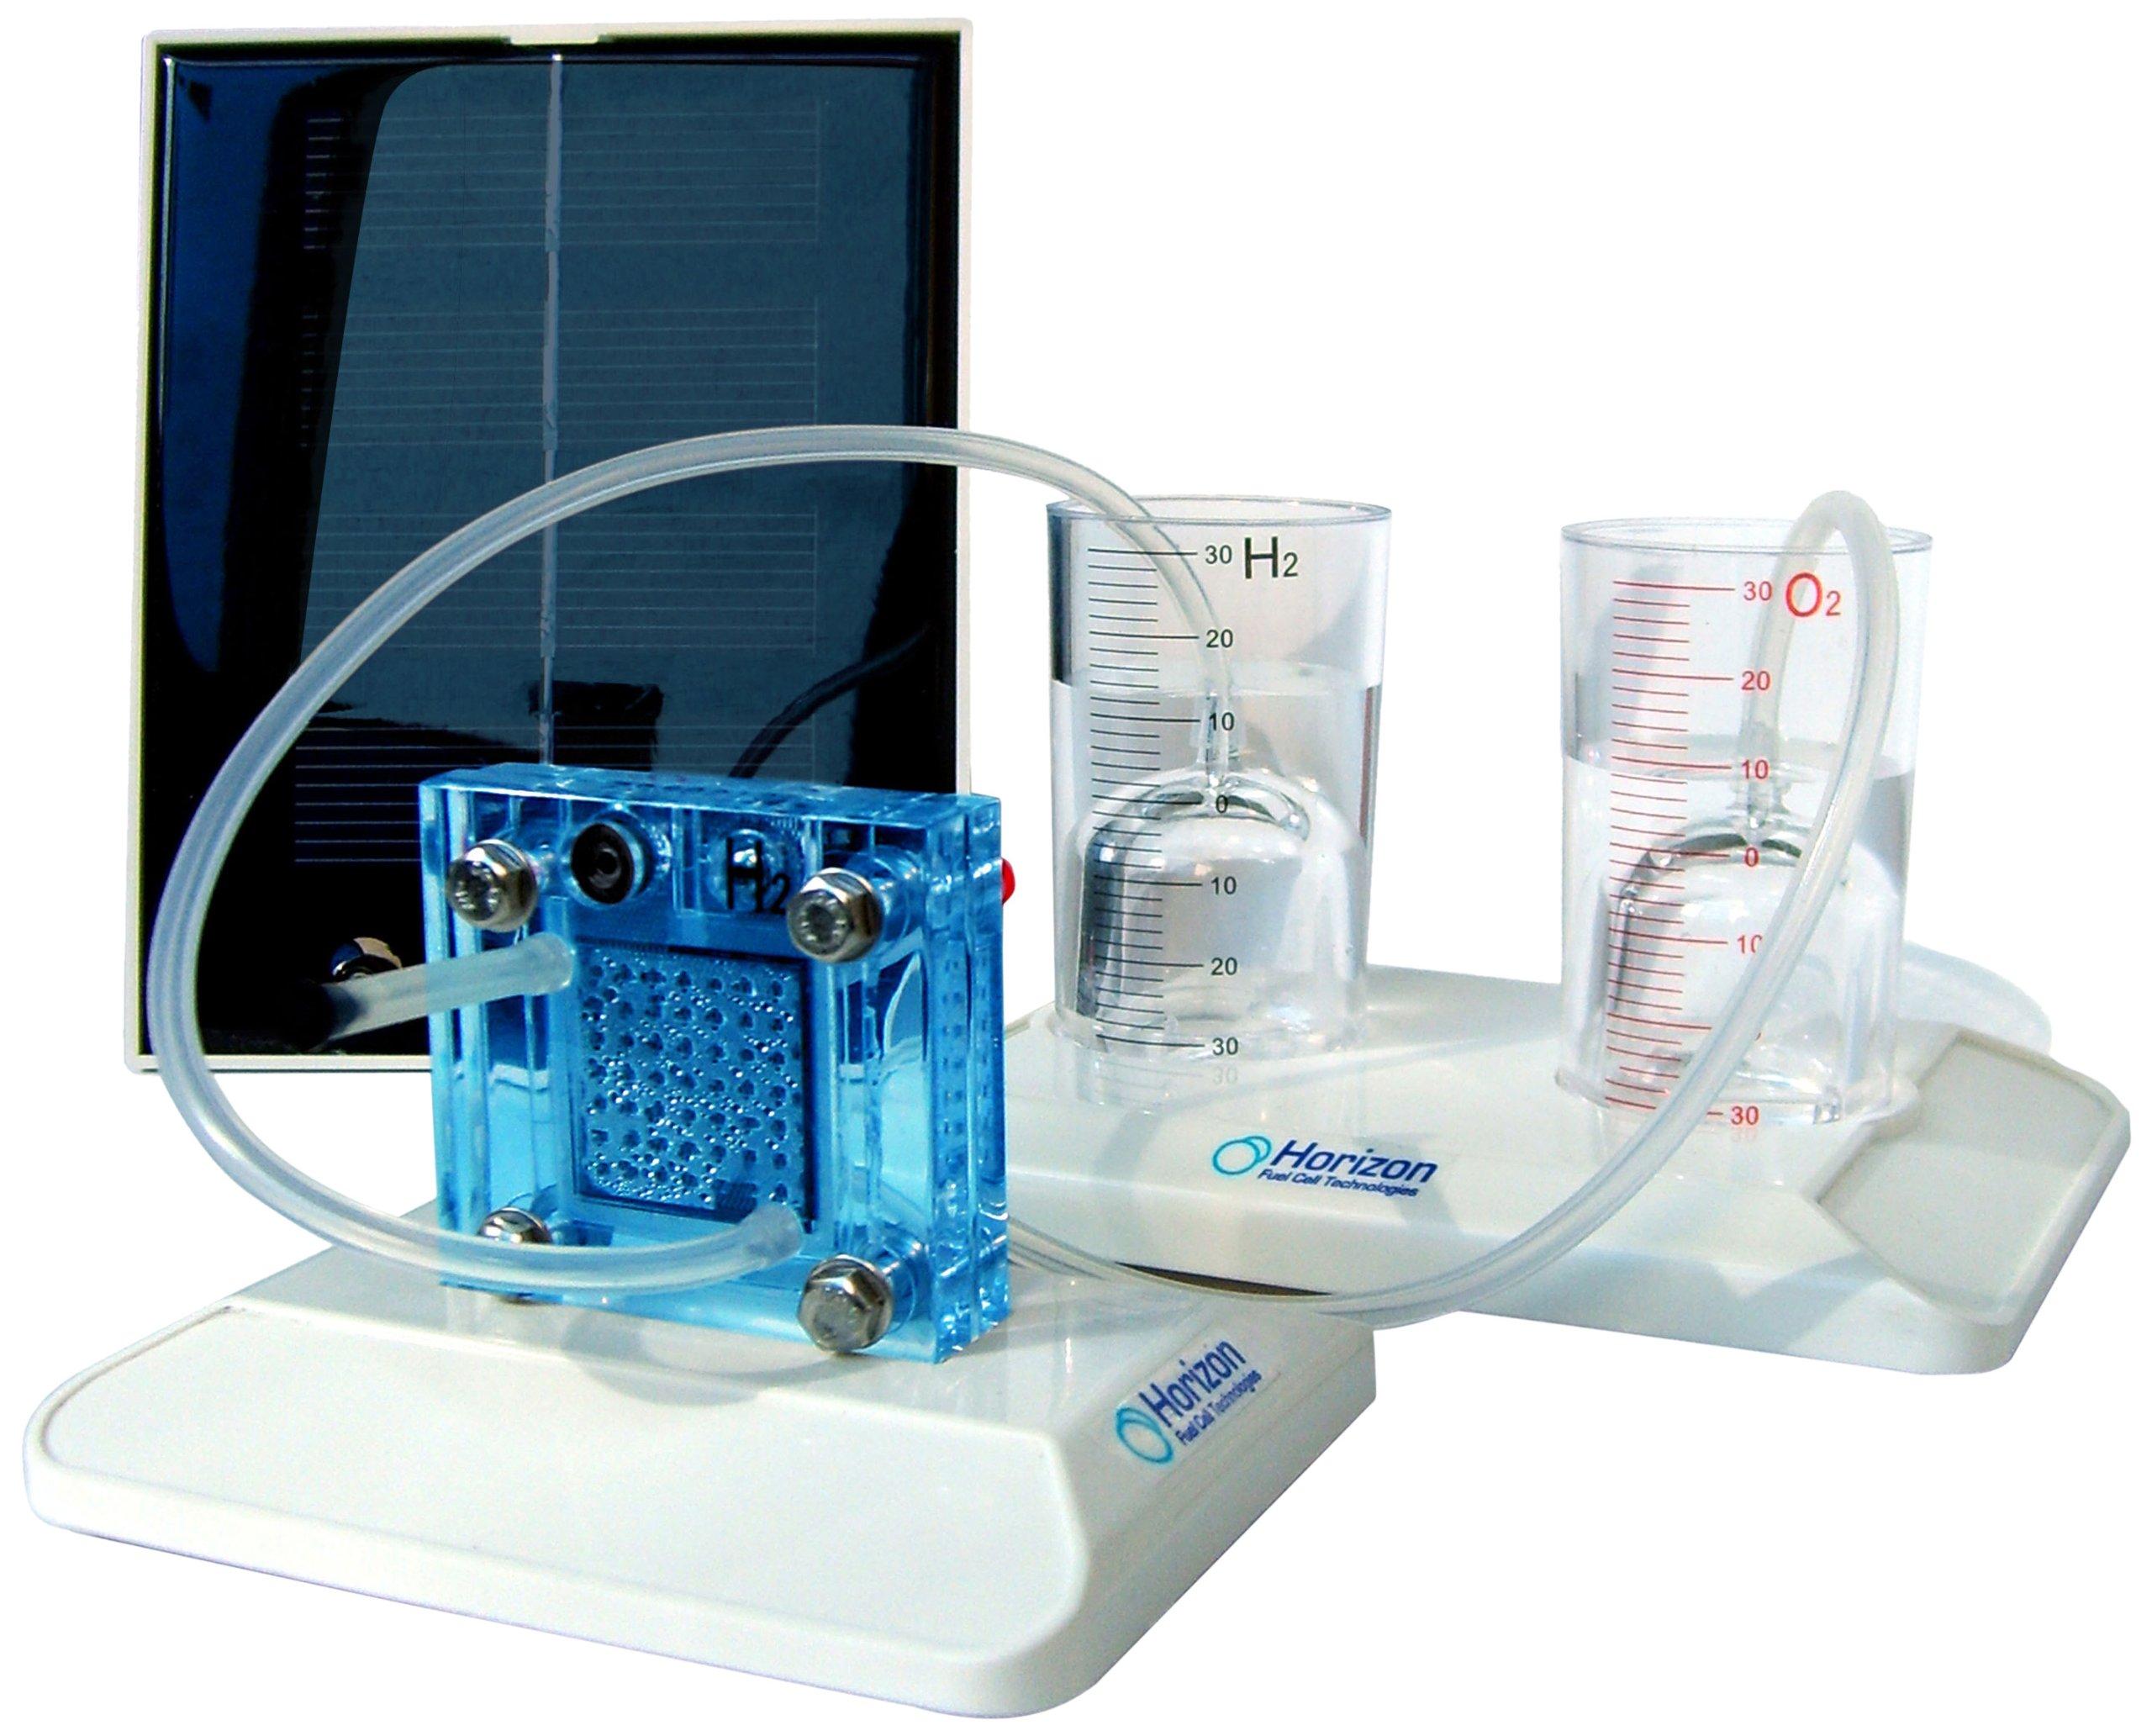 Horizon Fuel Cell Technologies Solar Hydrogen Education Kit by Horizon Fuel Cell Technologies